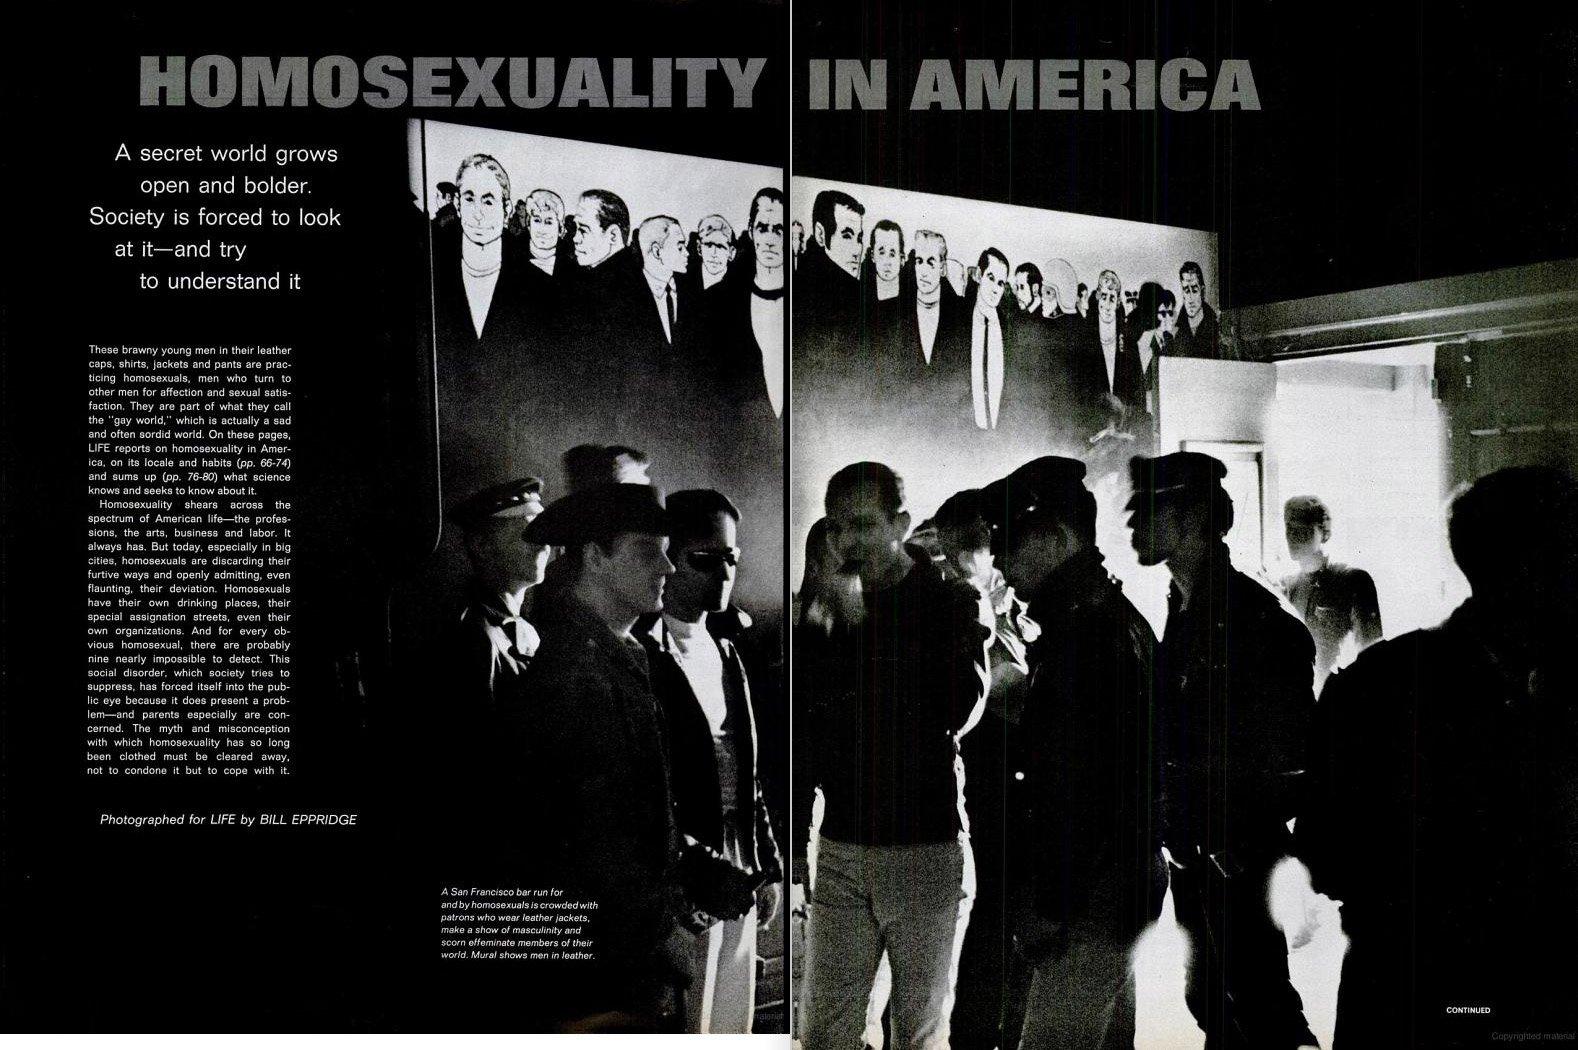 150520-homosexuality-america-01.jpg